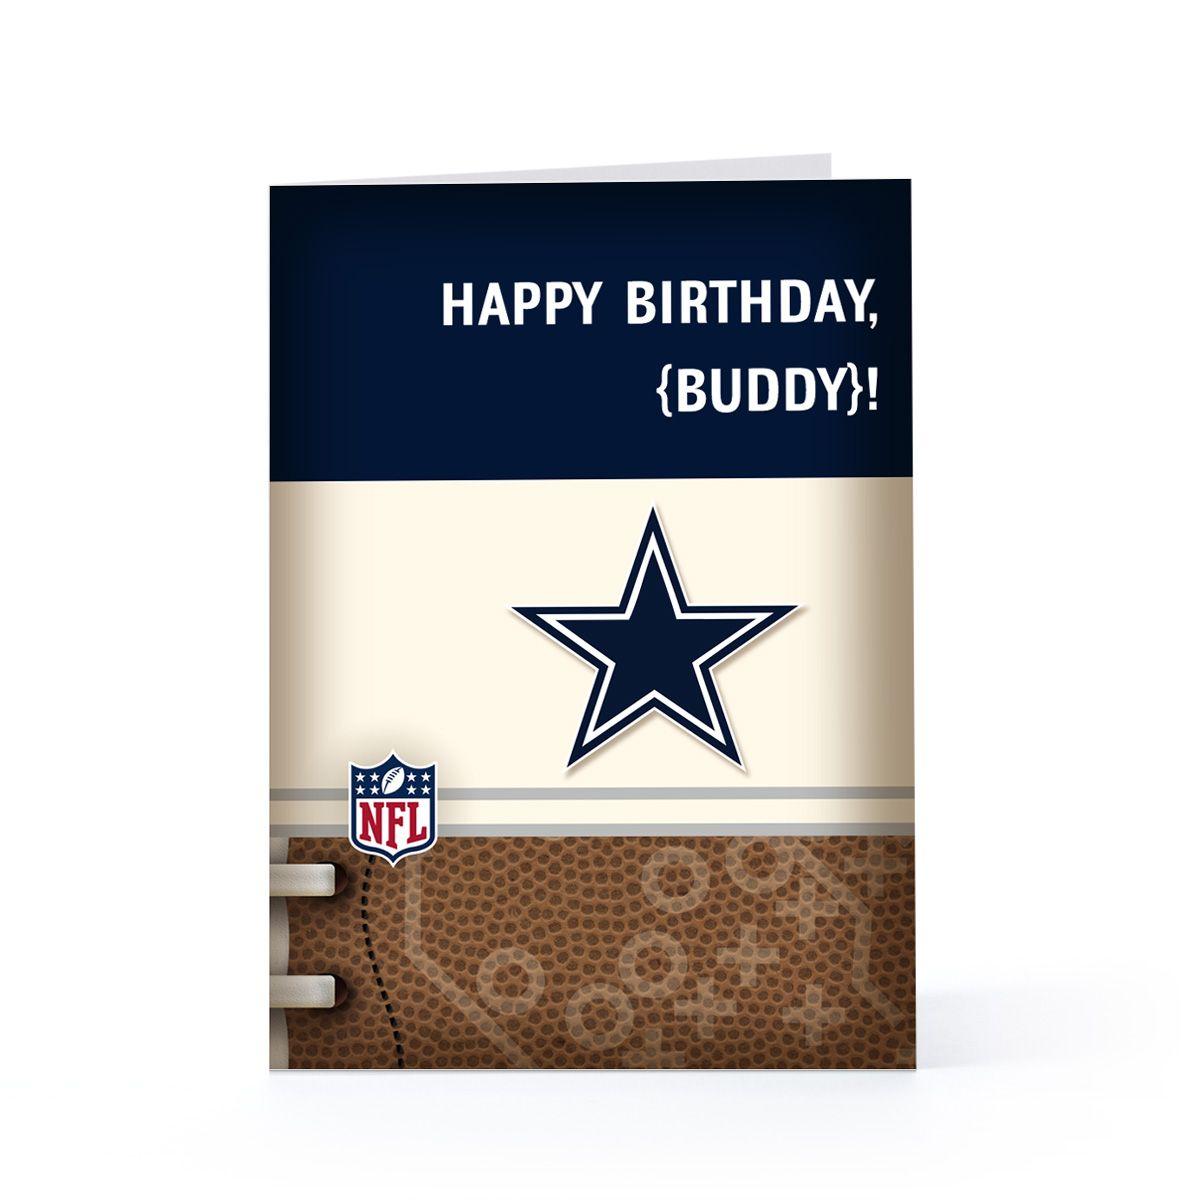 Dallas cowboys birthday cards other hallmark sites birthday dallas cowboys birthday cards other hallmark sites kristyandbryce Choice Image